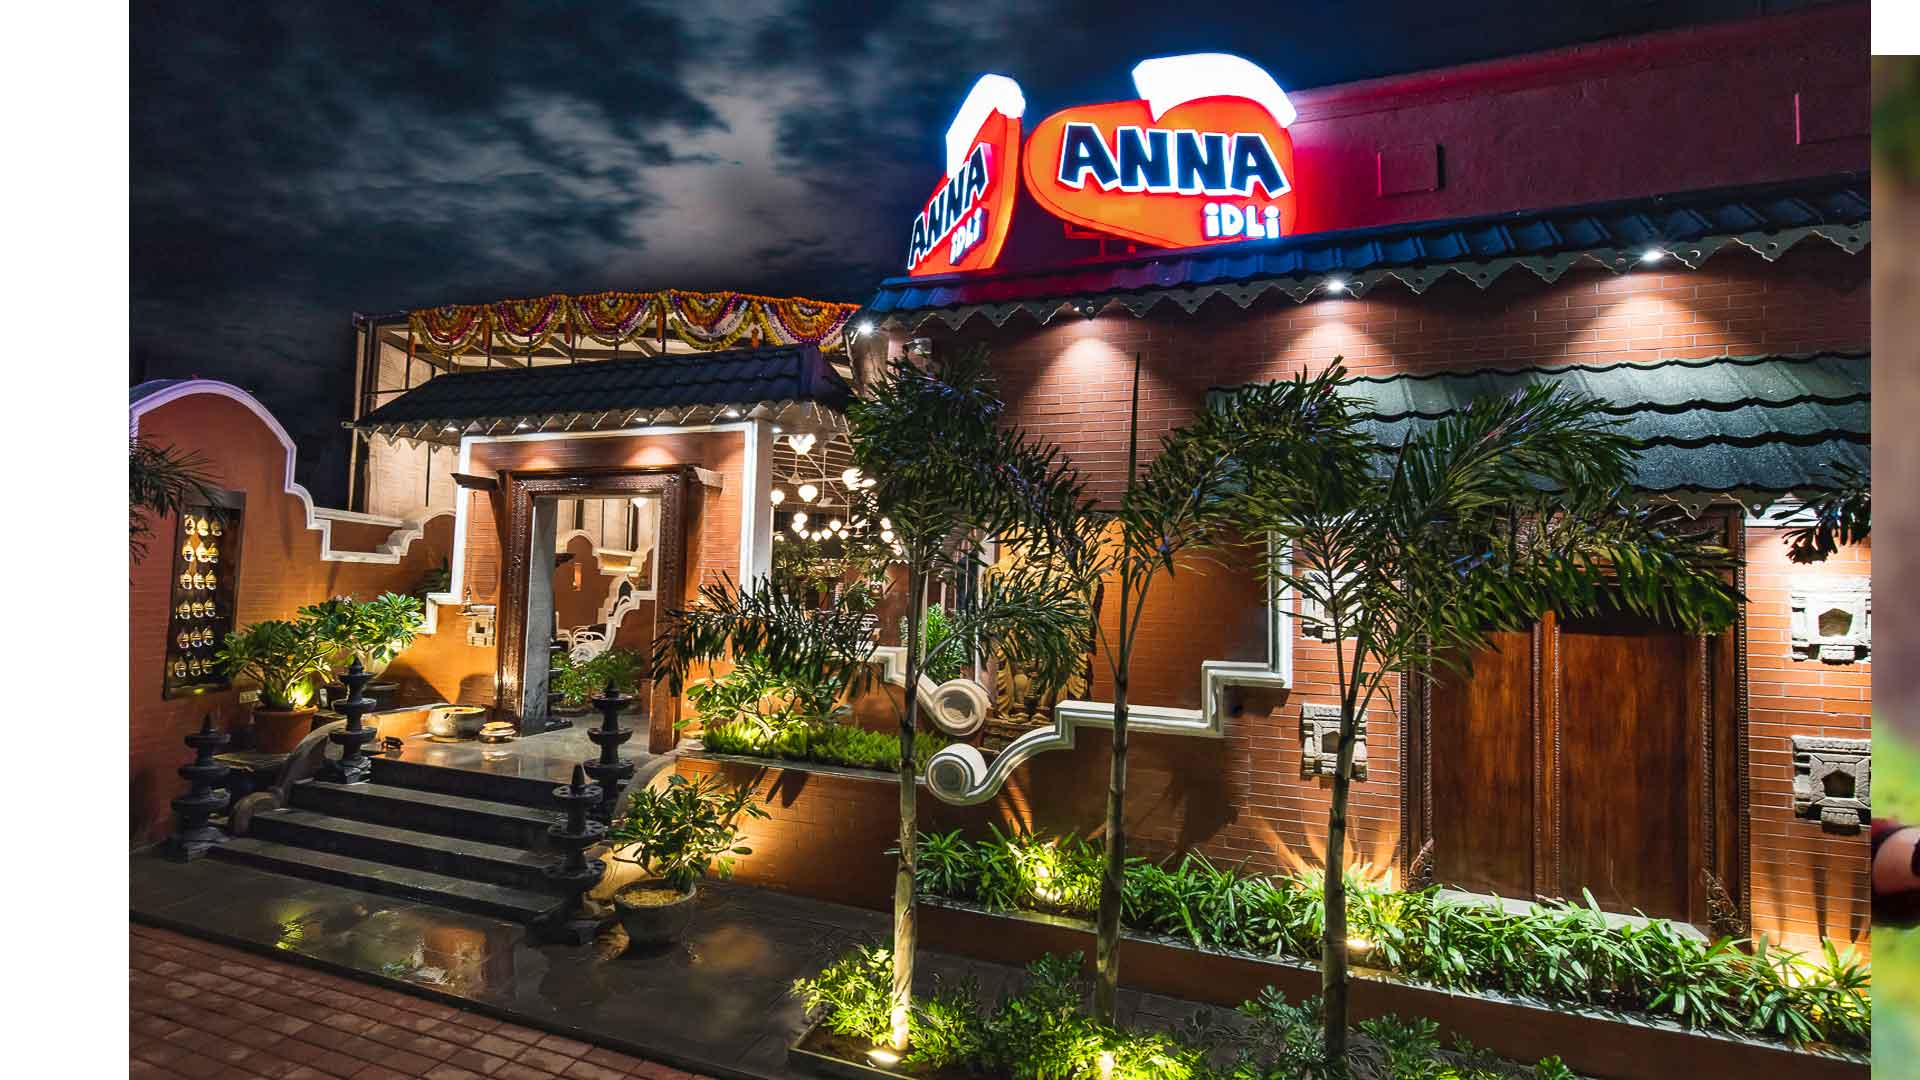 Anna-Idli-Main-Image